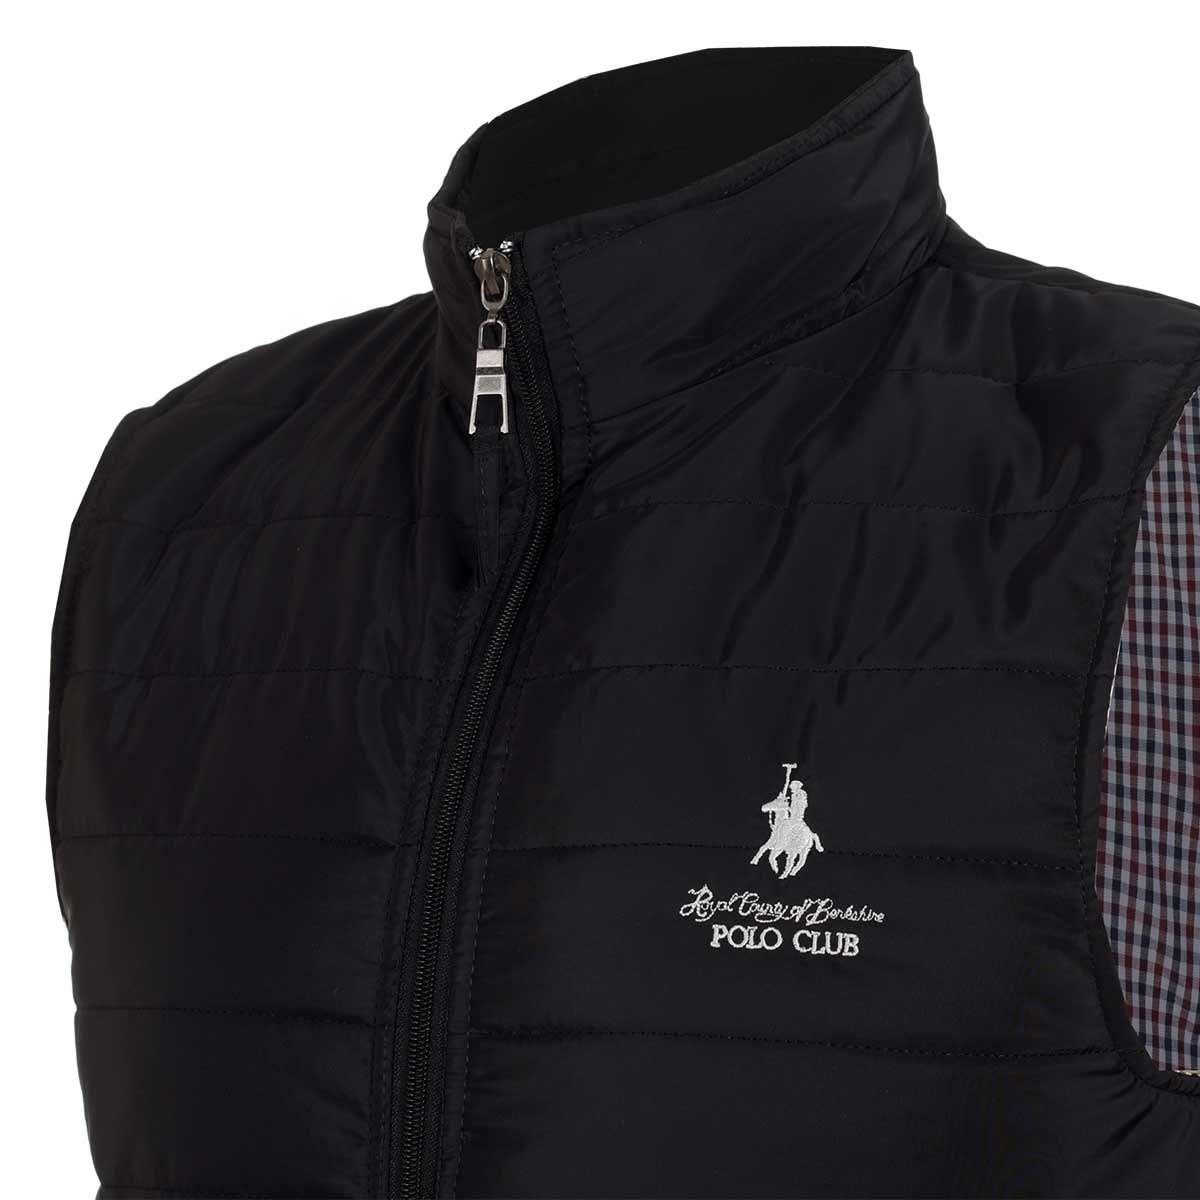 Chaleco Capitonado Polo Club